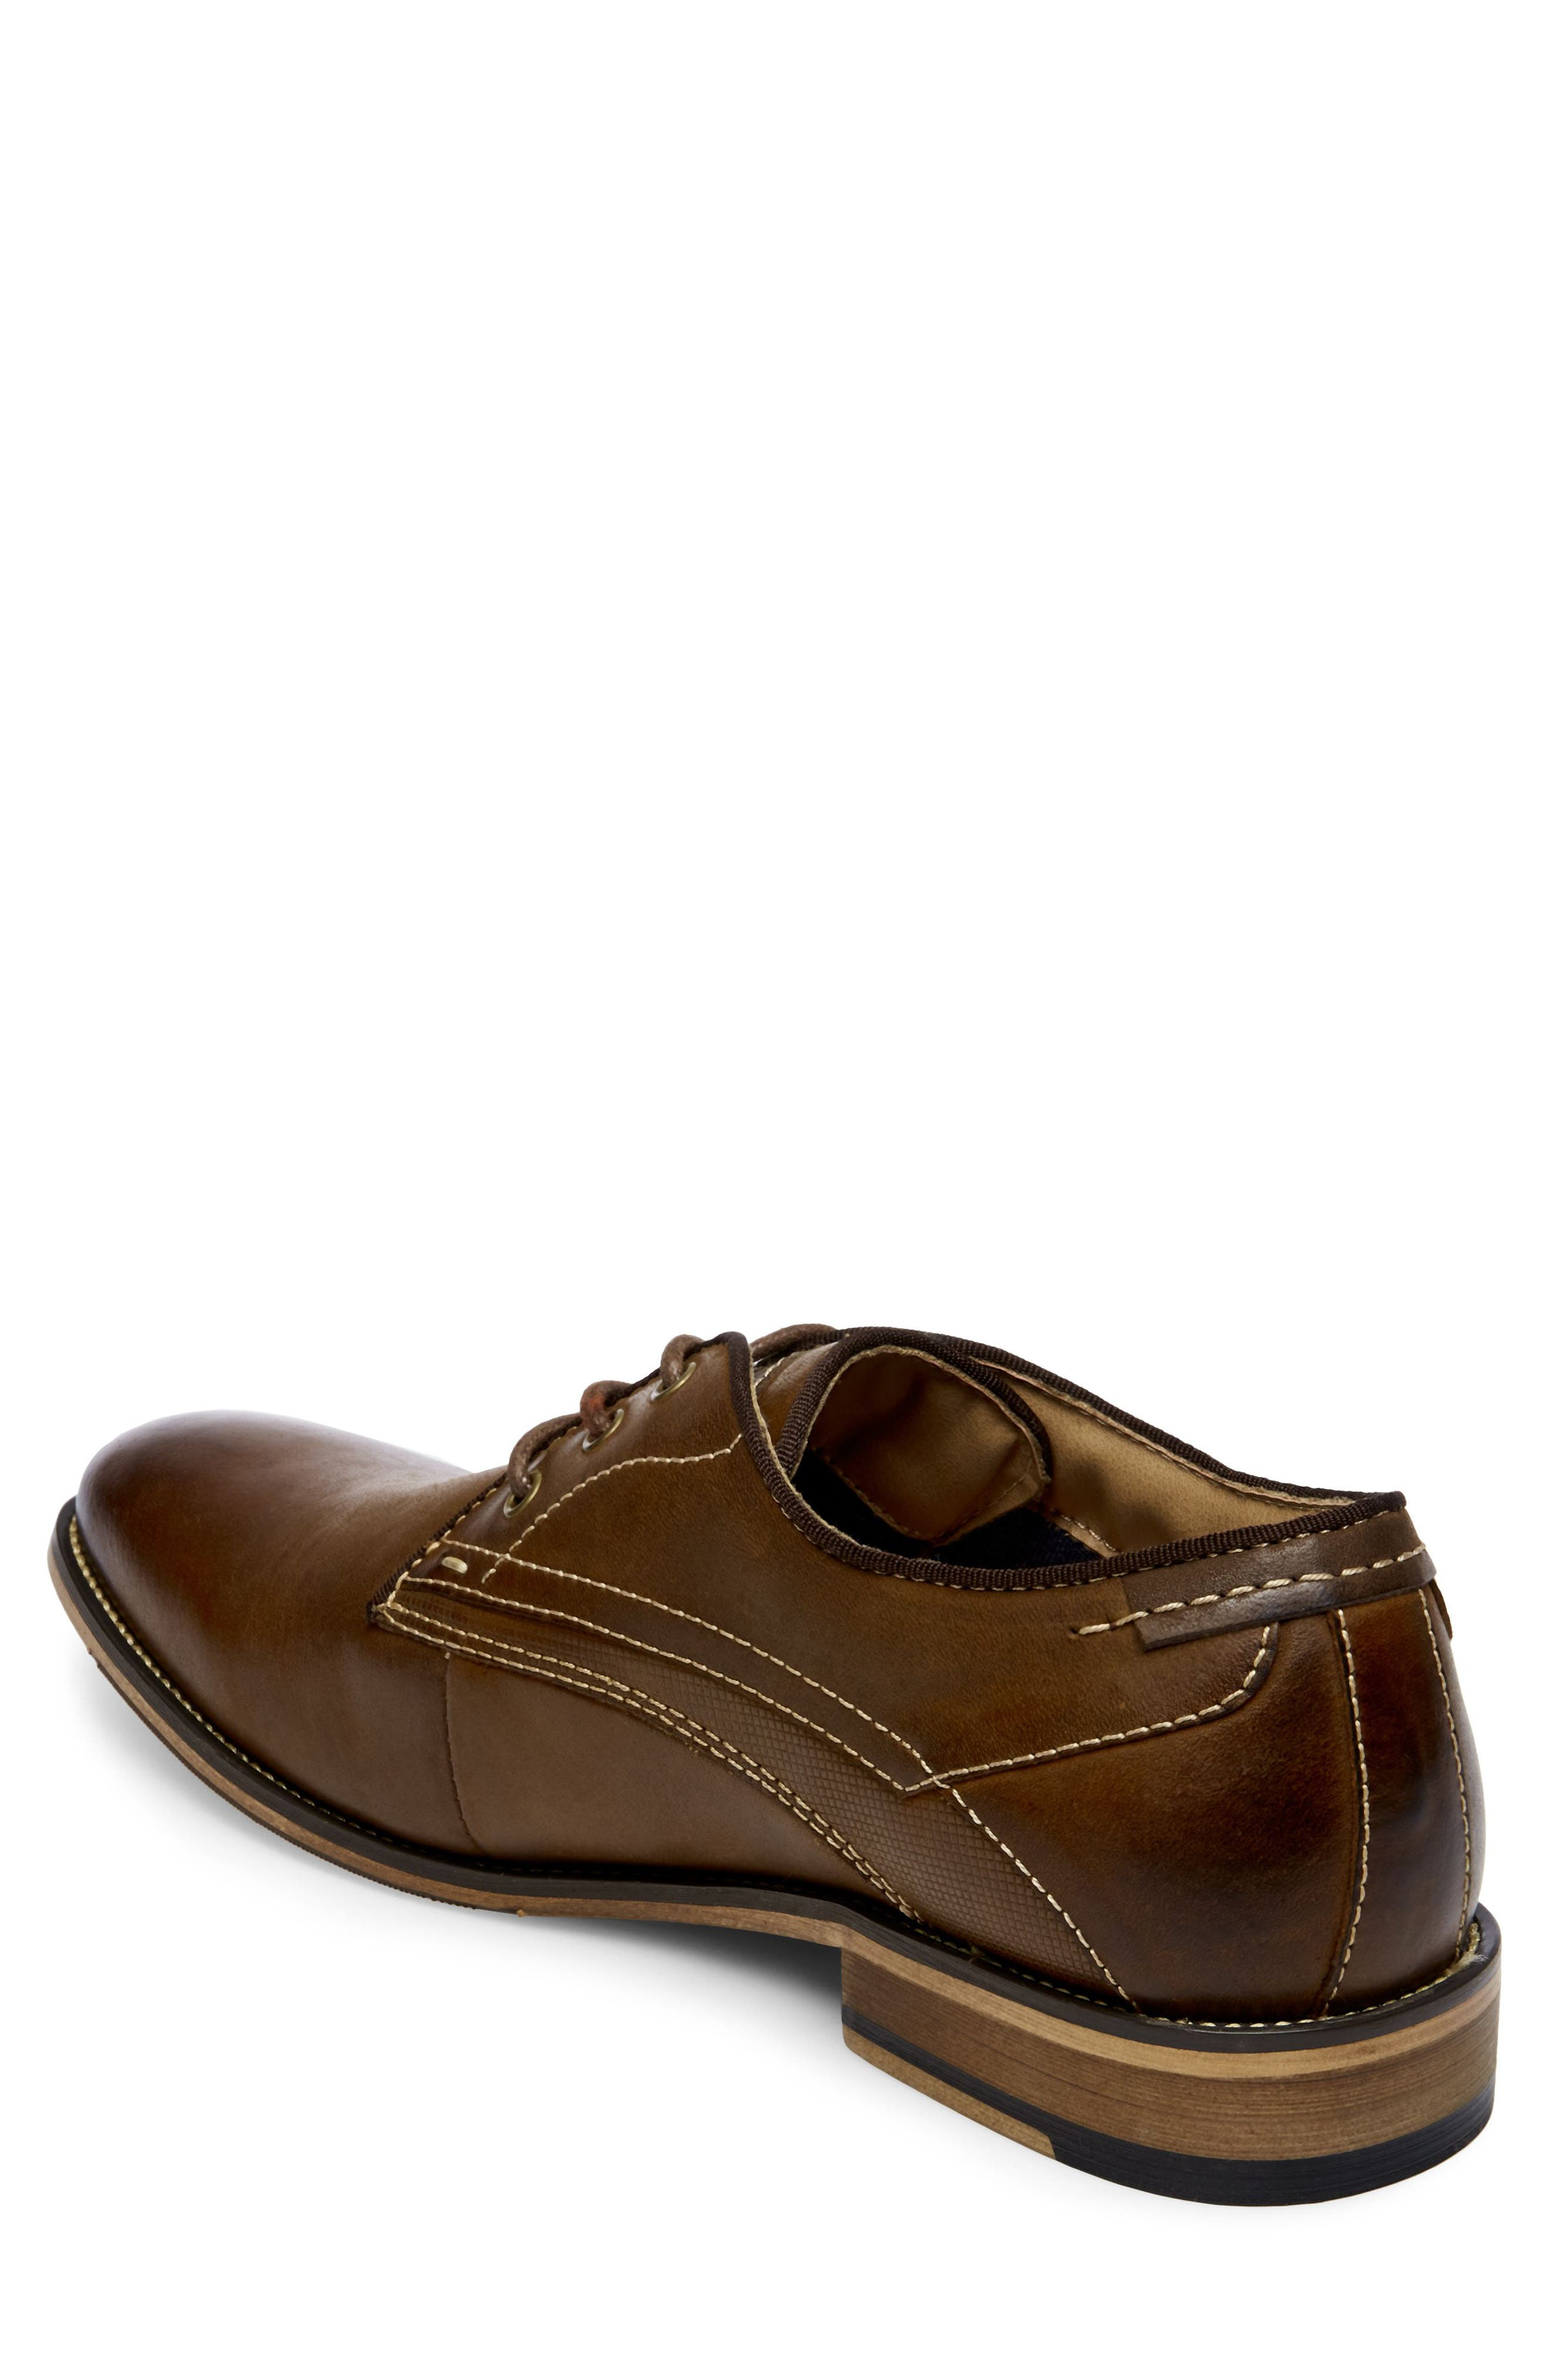 Jetset Plain Toe Derby,                             Alternate thumbnail 2, color,                             Dark Tan Leather